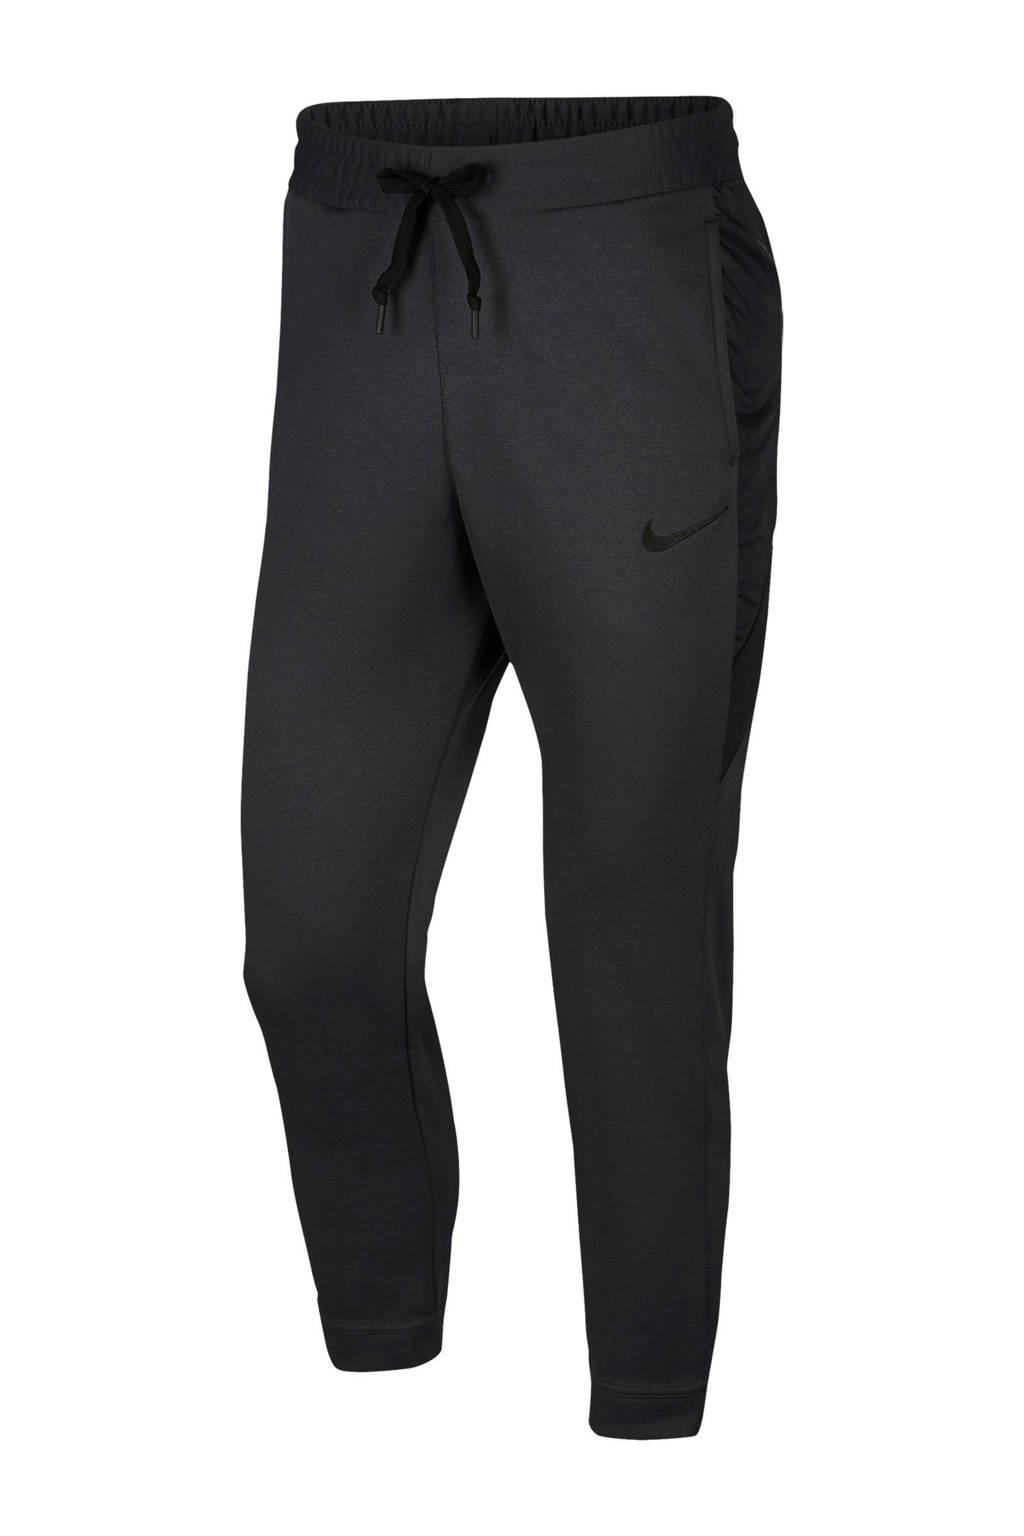 Nike   thermo sportbroek antraciet, Antraciet